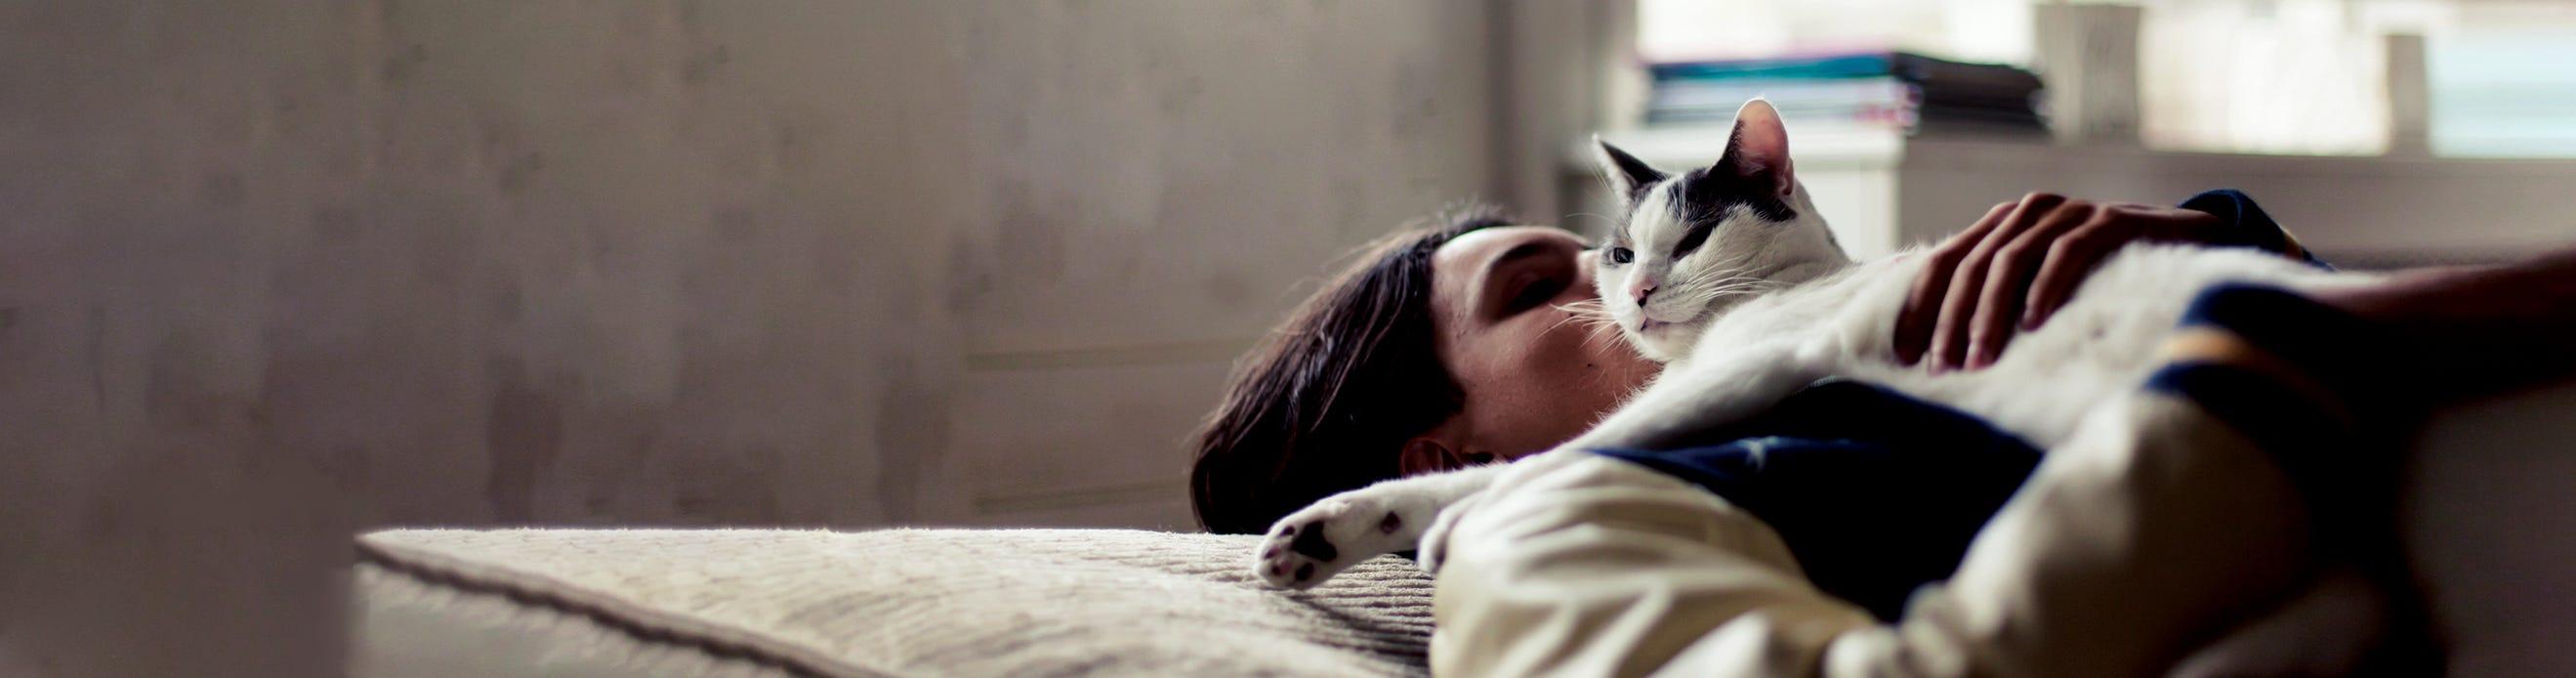 Current methods for managing cat allergens have limitations